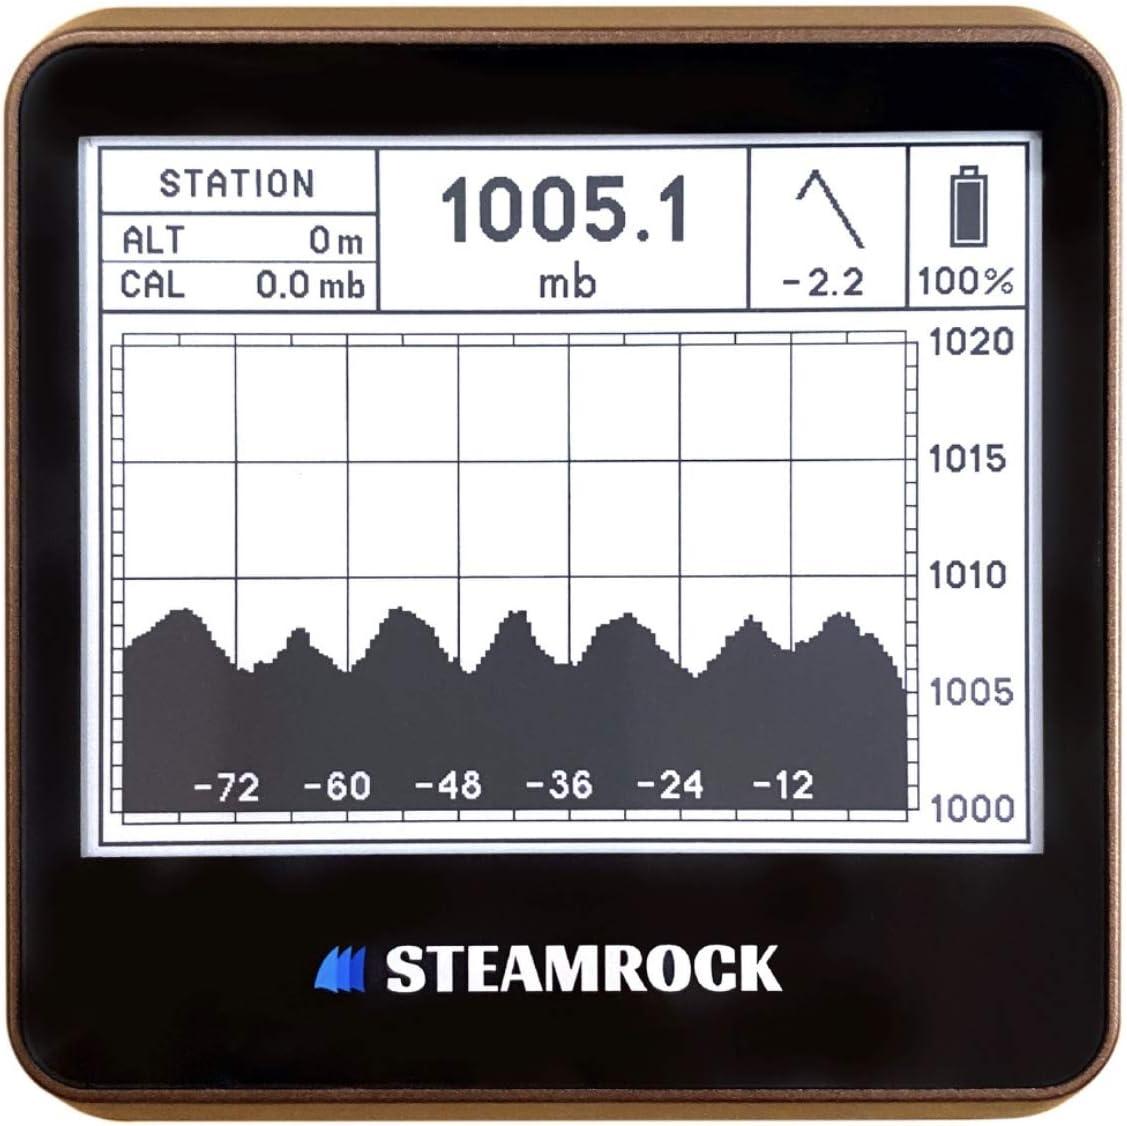 STEAMROCK Digital Barometer Barograph Max 43% OFF Brown Finally resale start